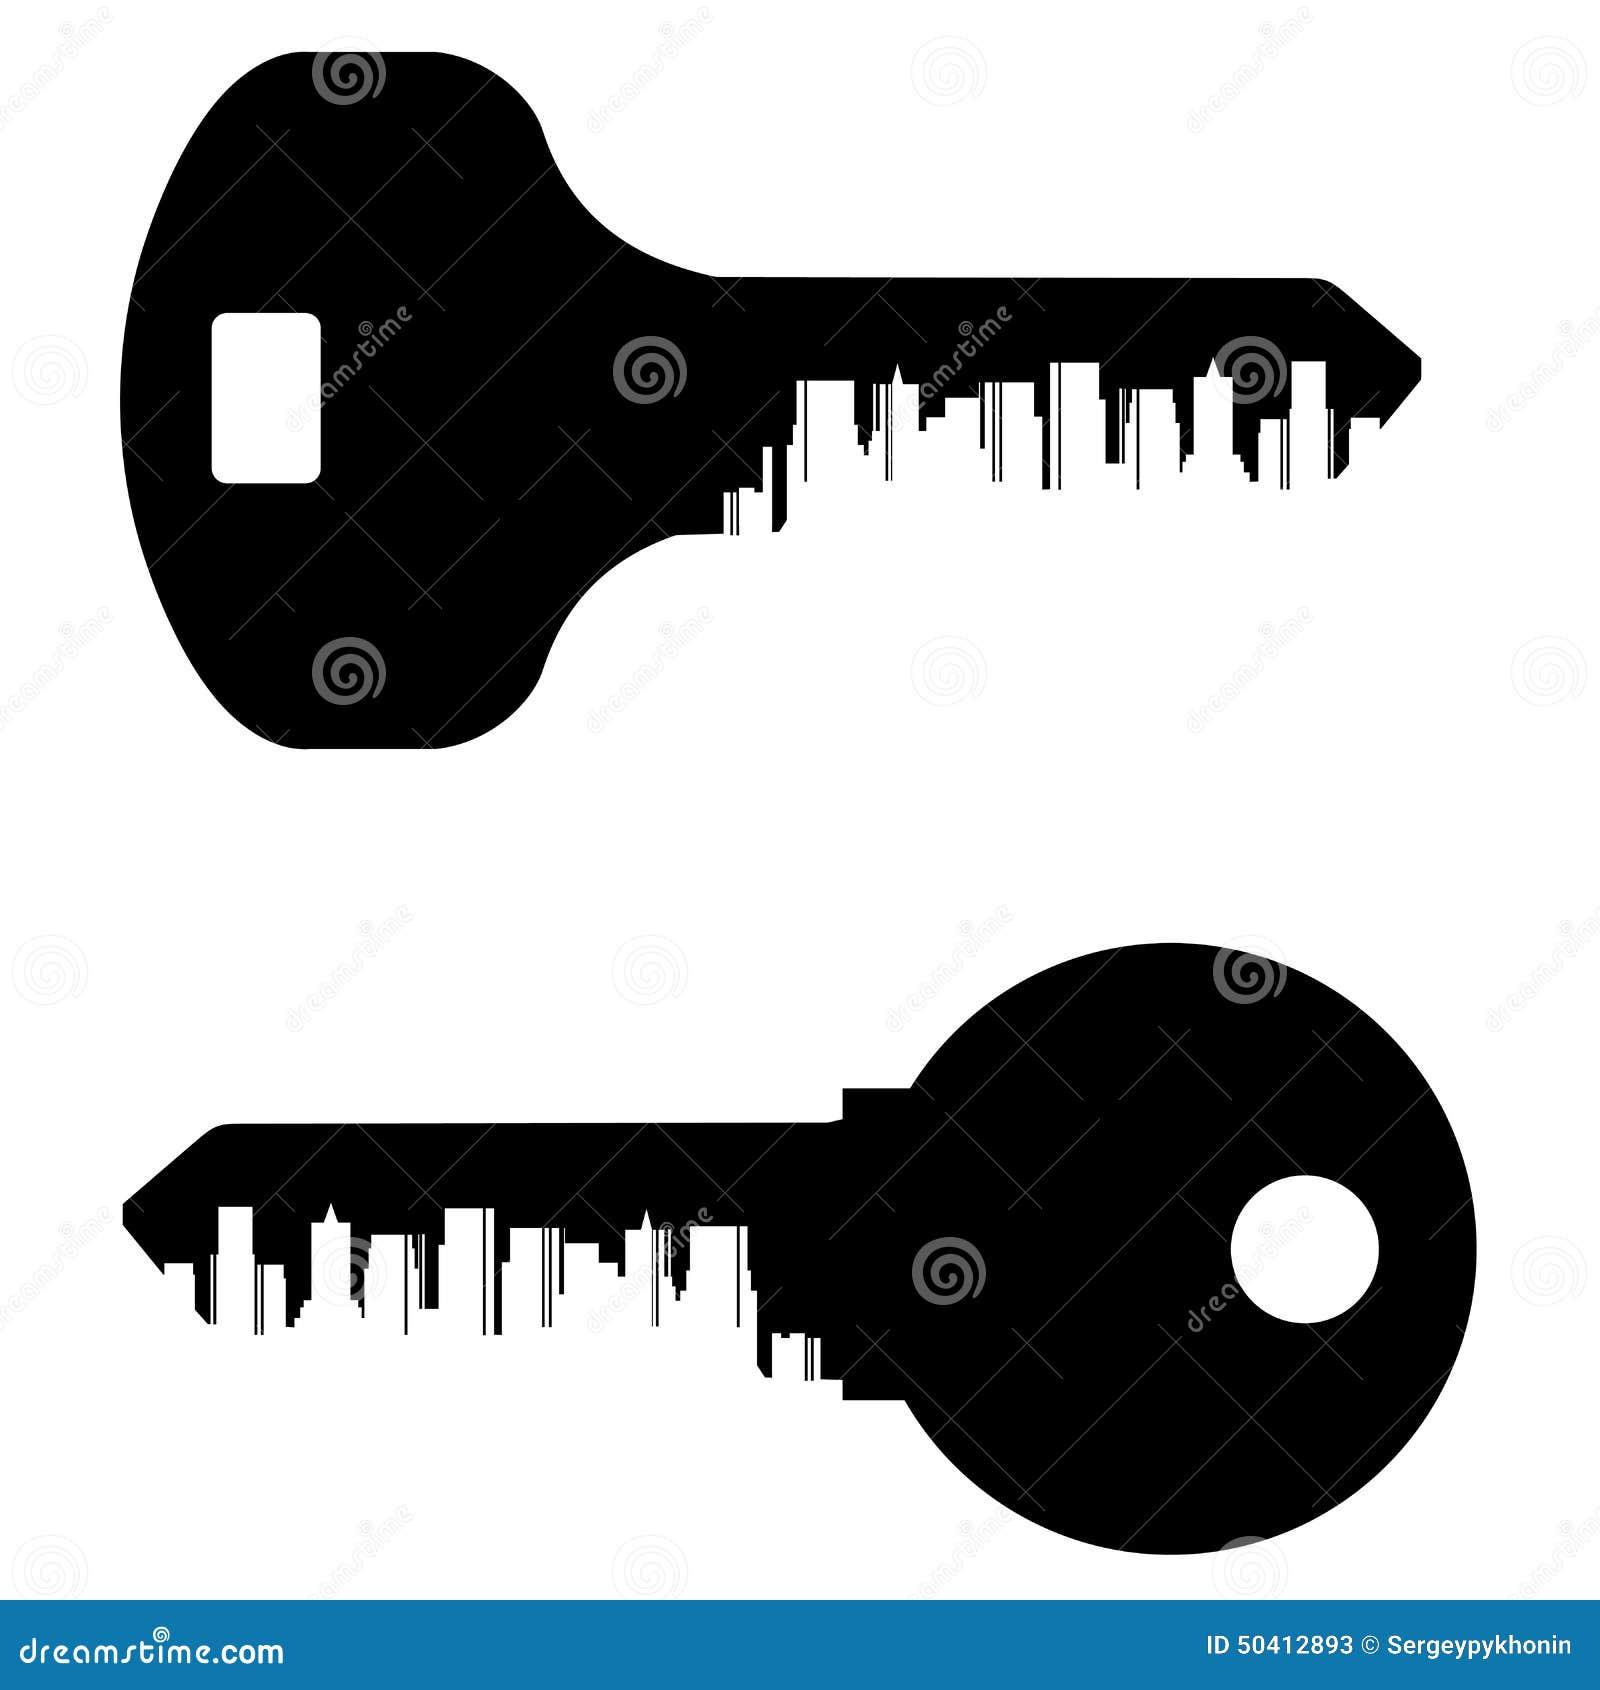 Vector Key Illustration: Key Vector Logo Design Template. City Or Town Icon Stock